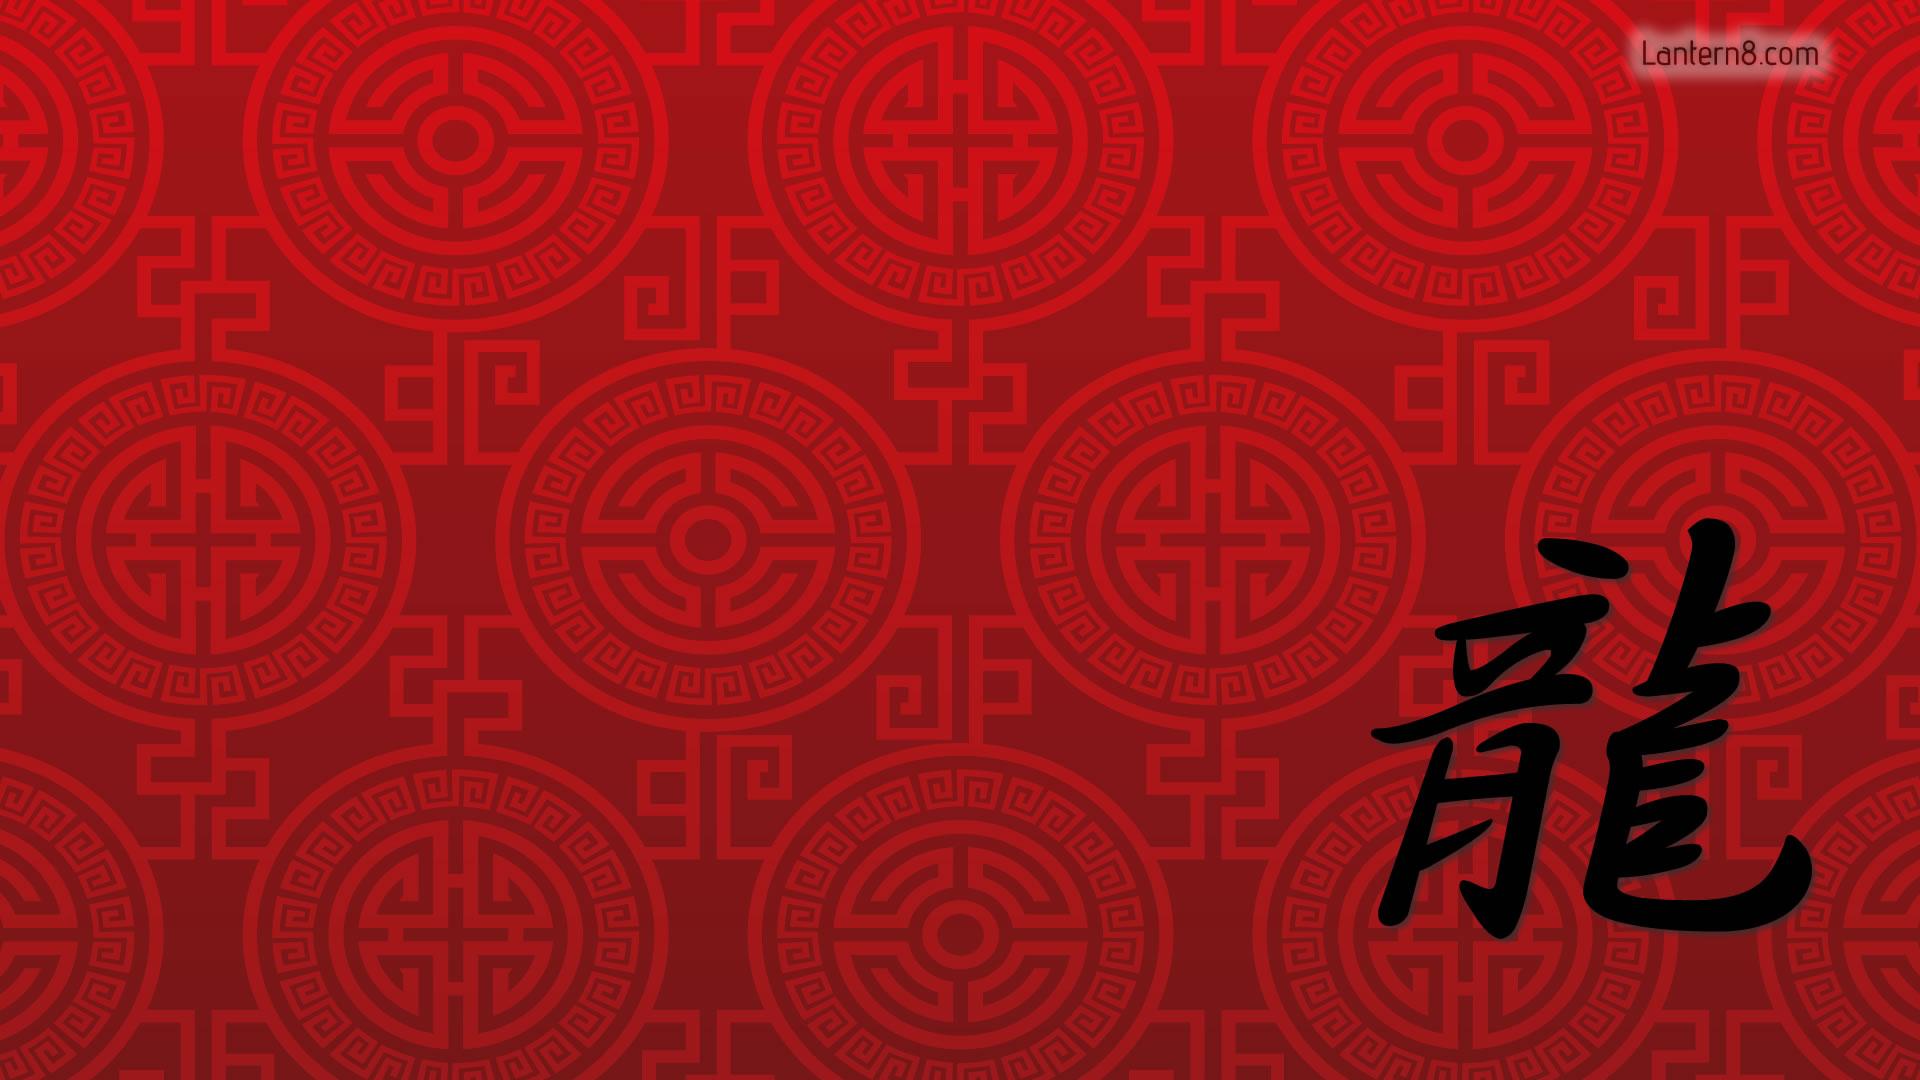 Chinese wallpaper 1920x1080 70342 1920x1080